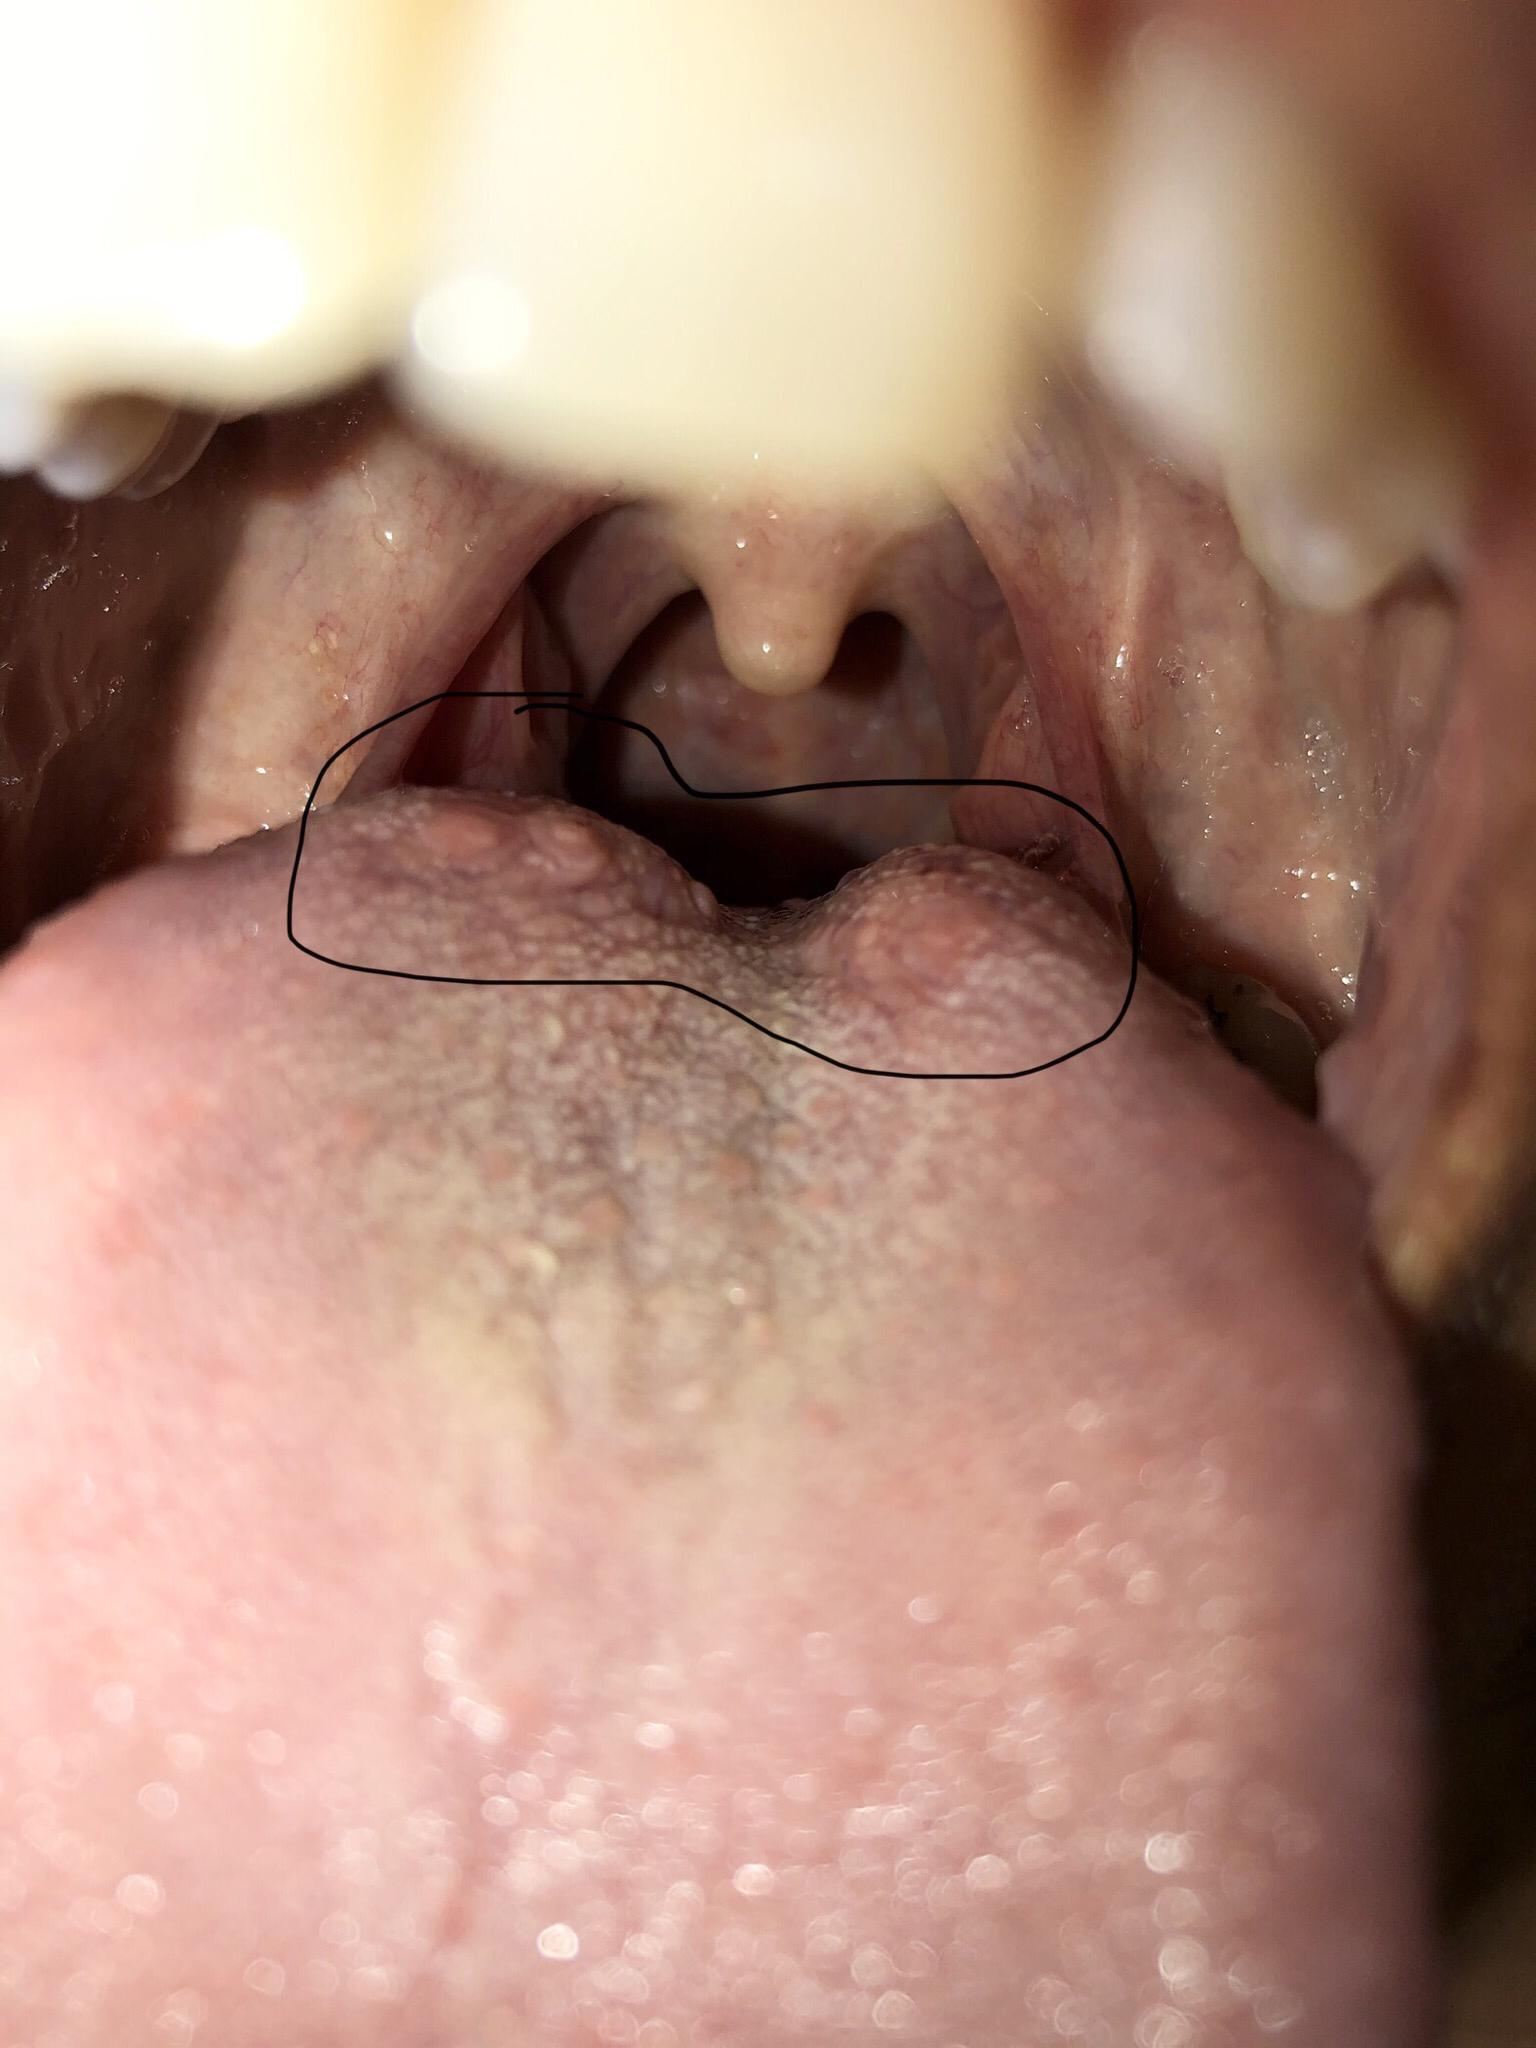 Hpv cancer back of tongue Înțelesul